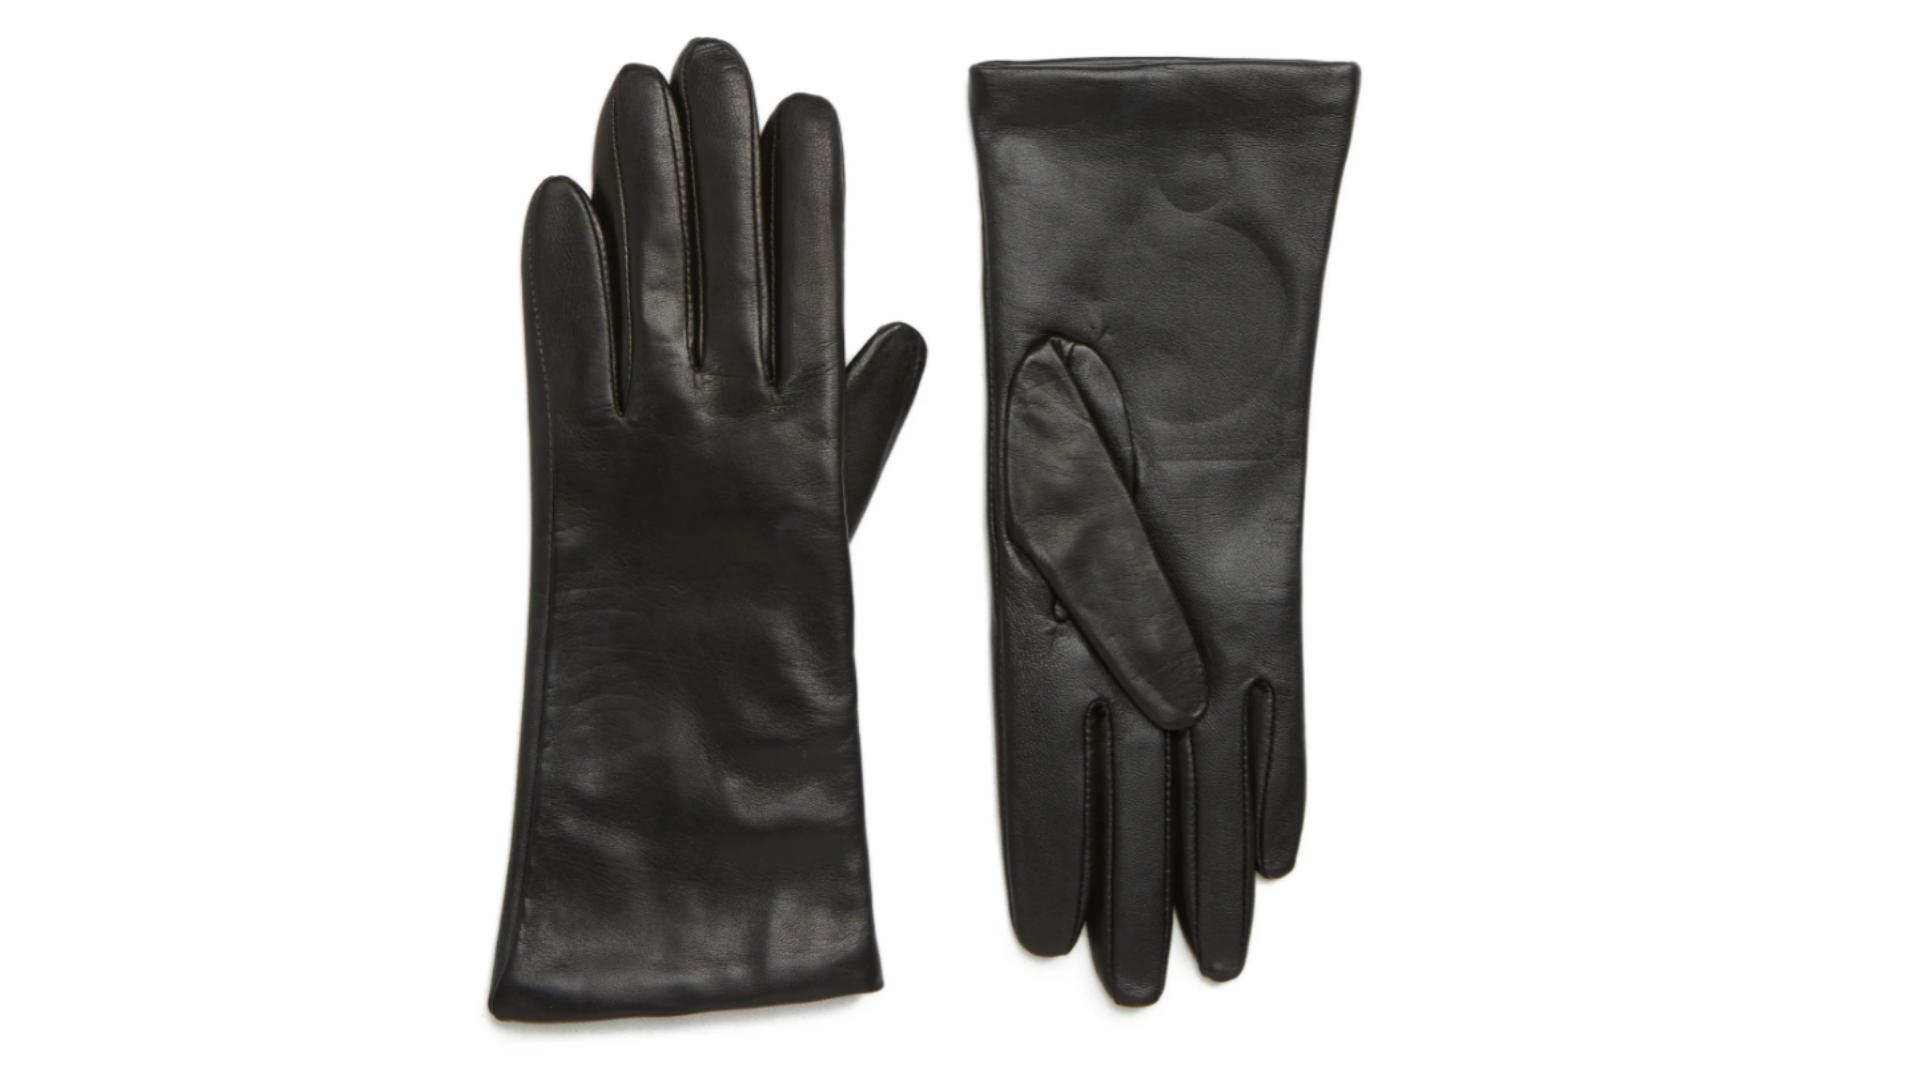 Nordstrom best winter gloves